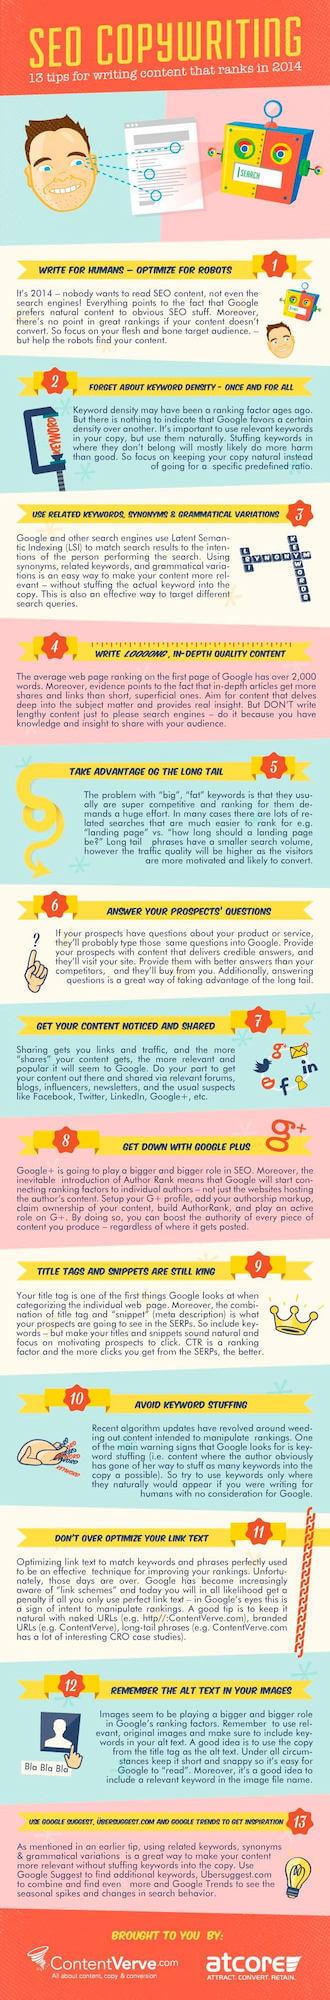 consejos seo copywriting